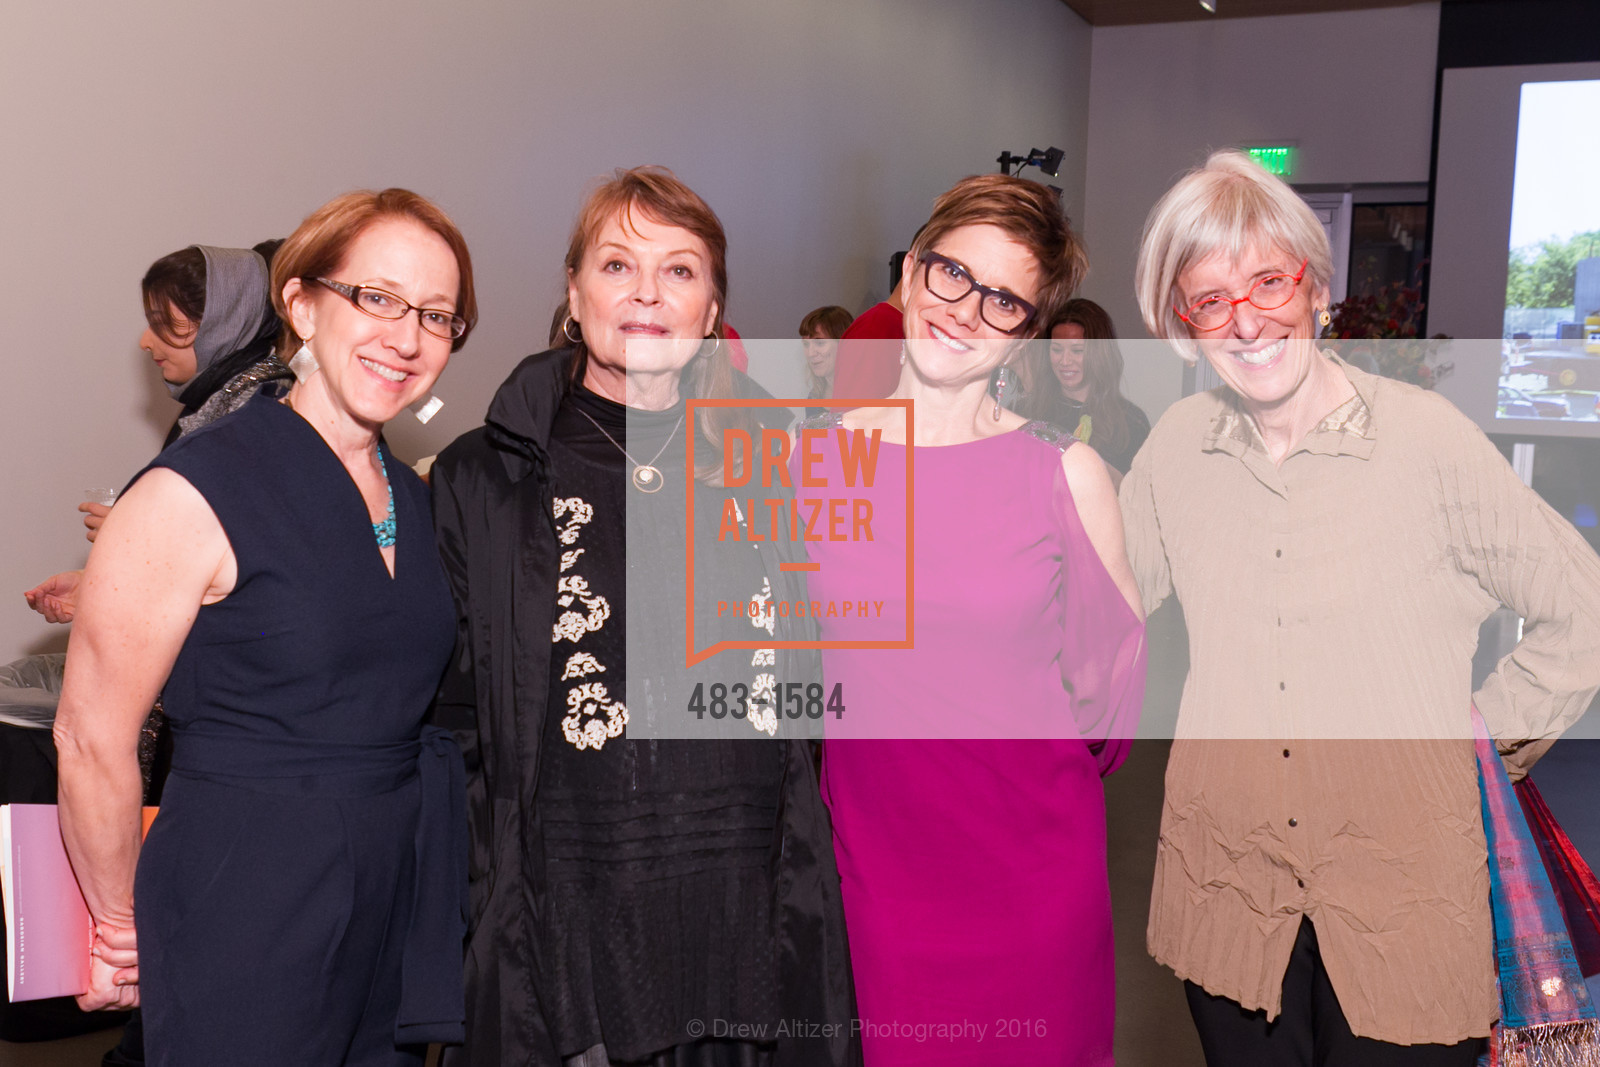 Sarah Teagle, Twila Thiebaud, Dorsey Griffith, Gina Werfel, Director's Debut, Manetti Shrem Museum of Art. Old Davis Road at Alumni Lane, November 12th, 2016